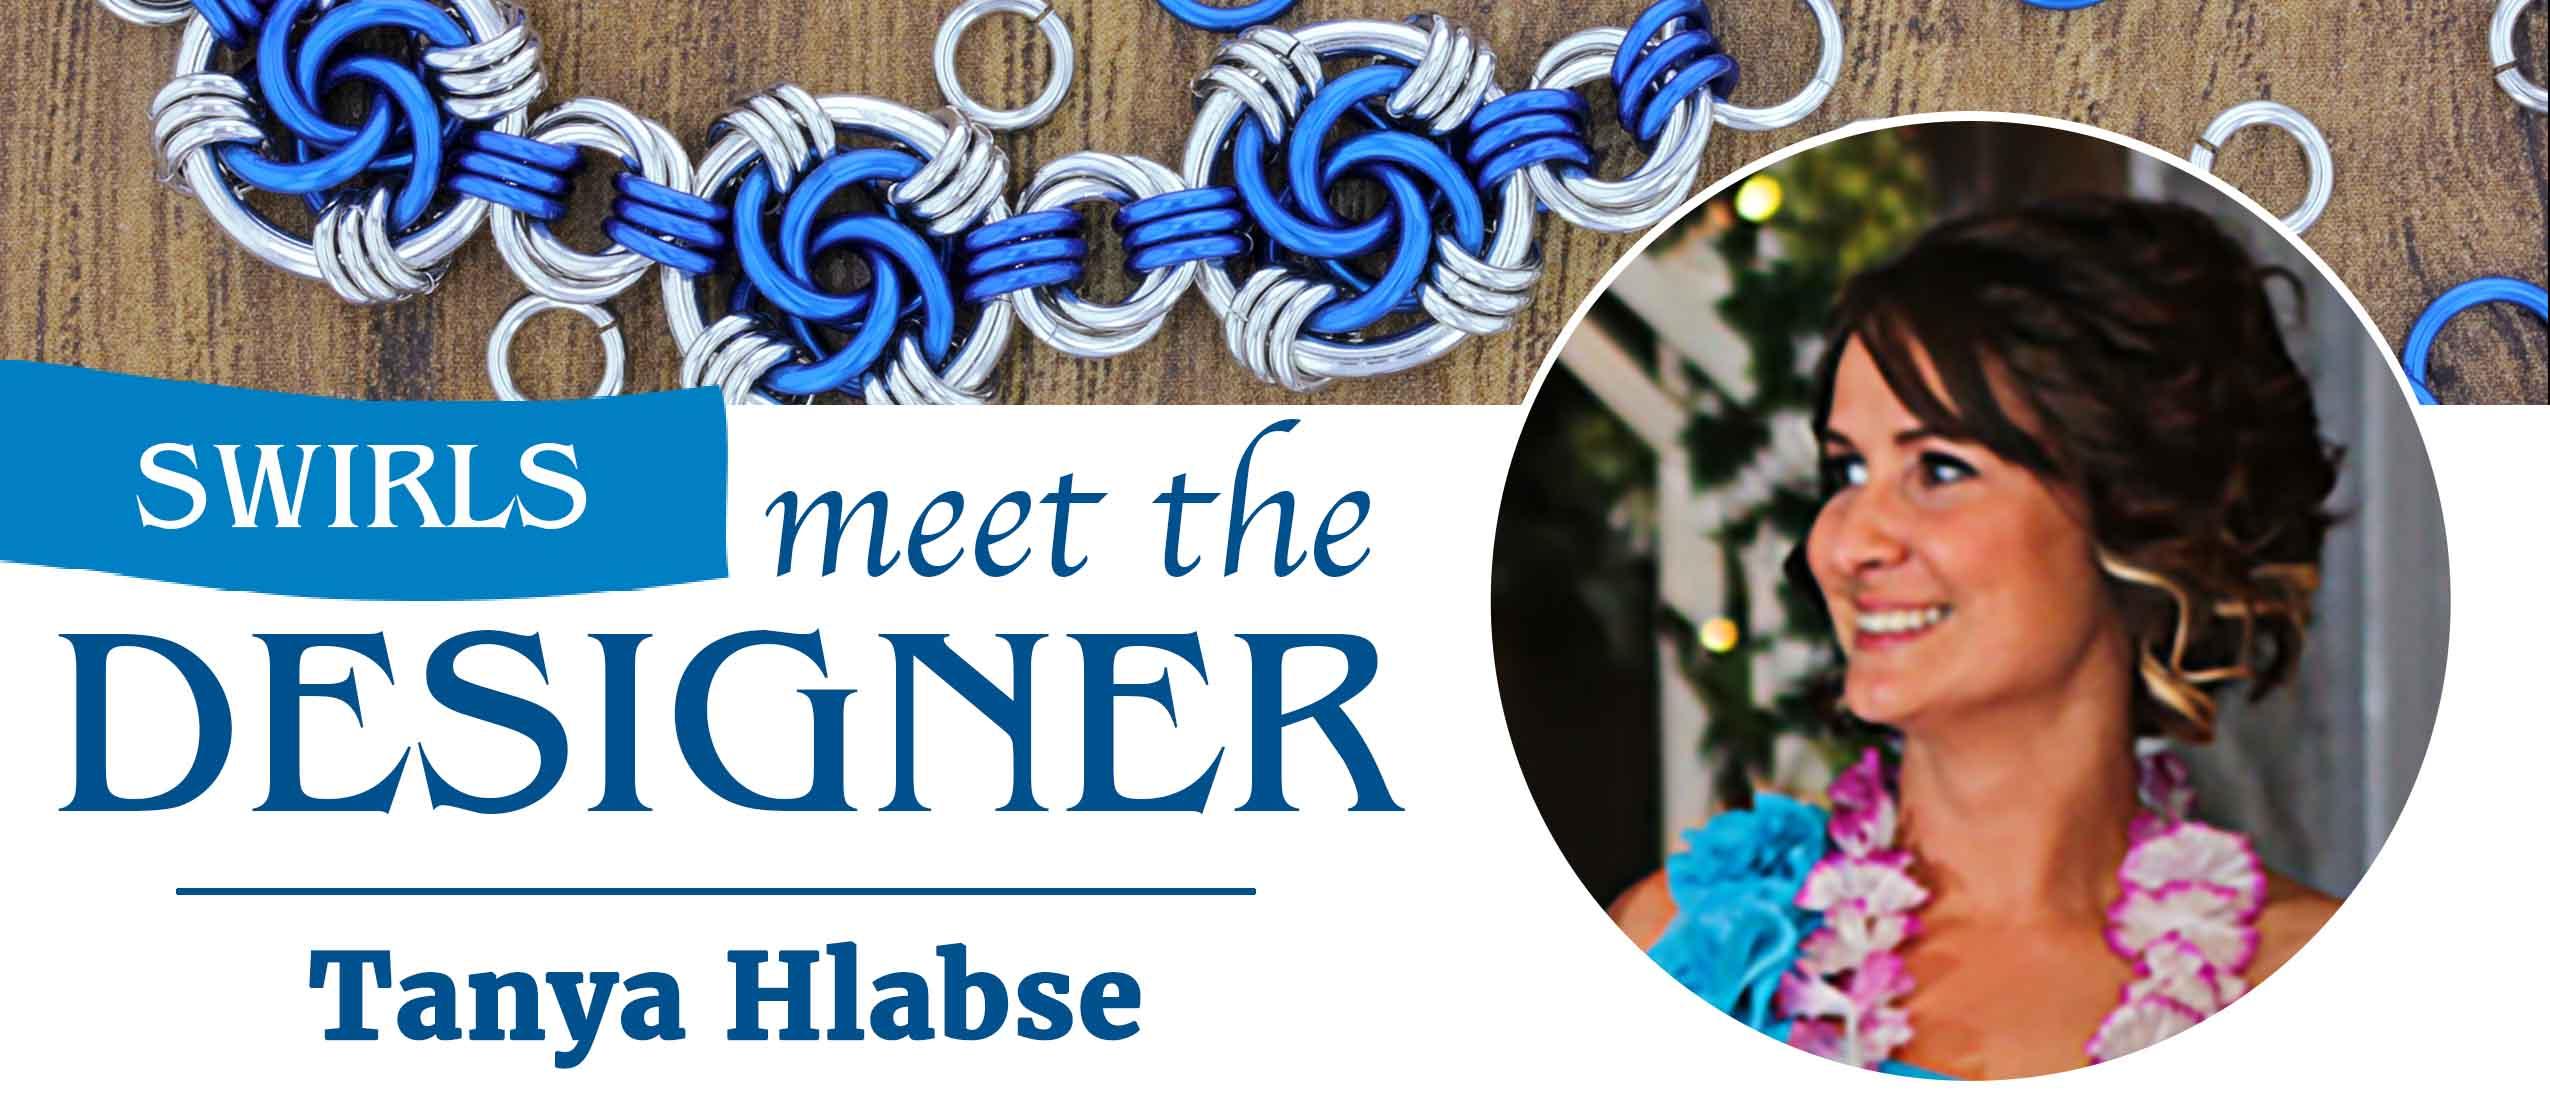 meet-the-designers-tanya-hlabse-swirls-bracelet-kits-.jpg